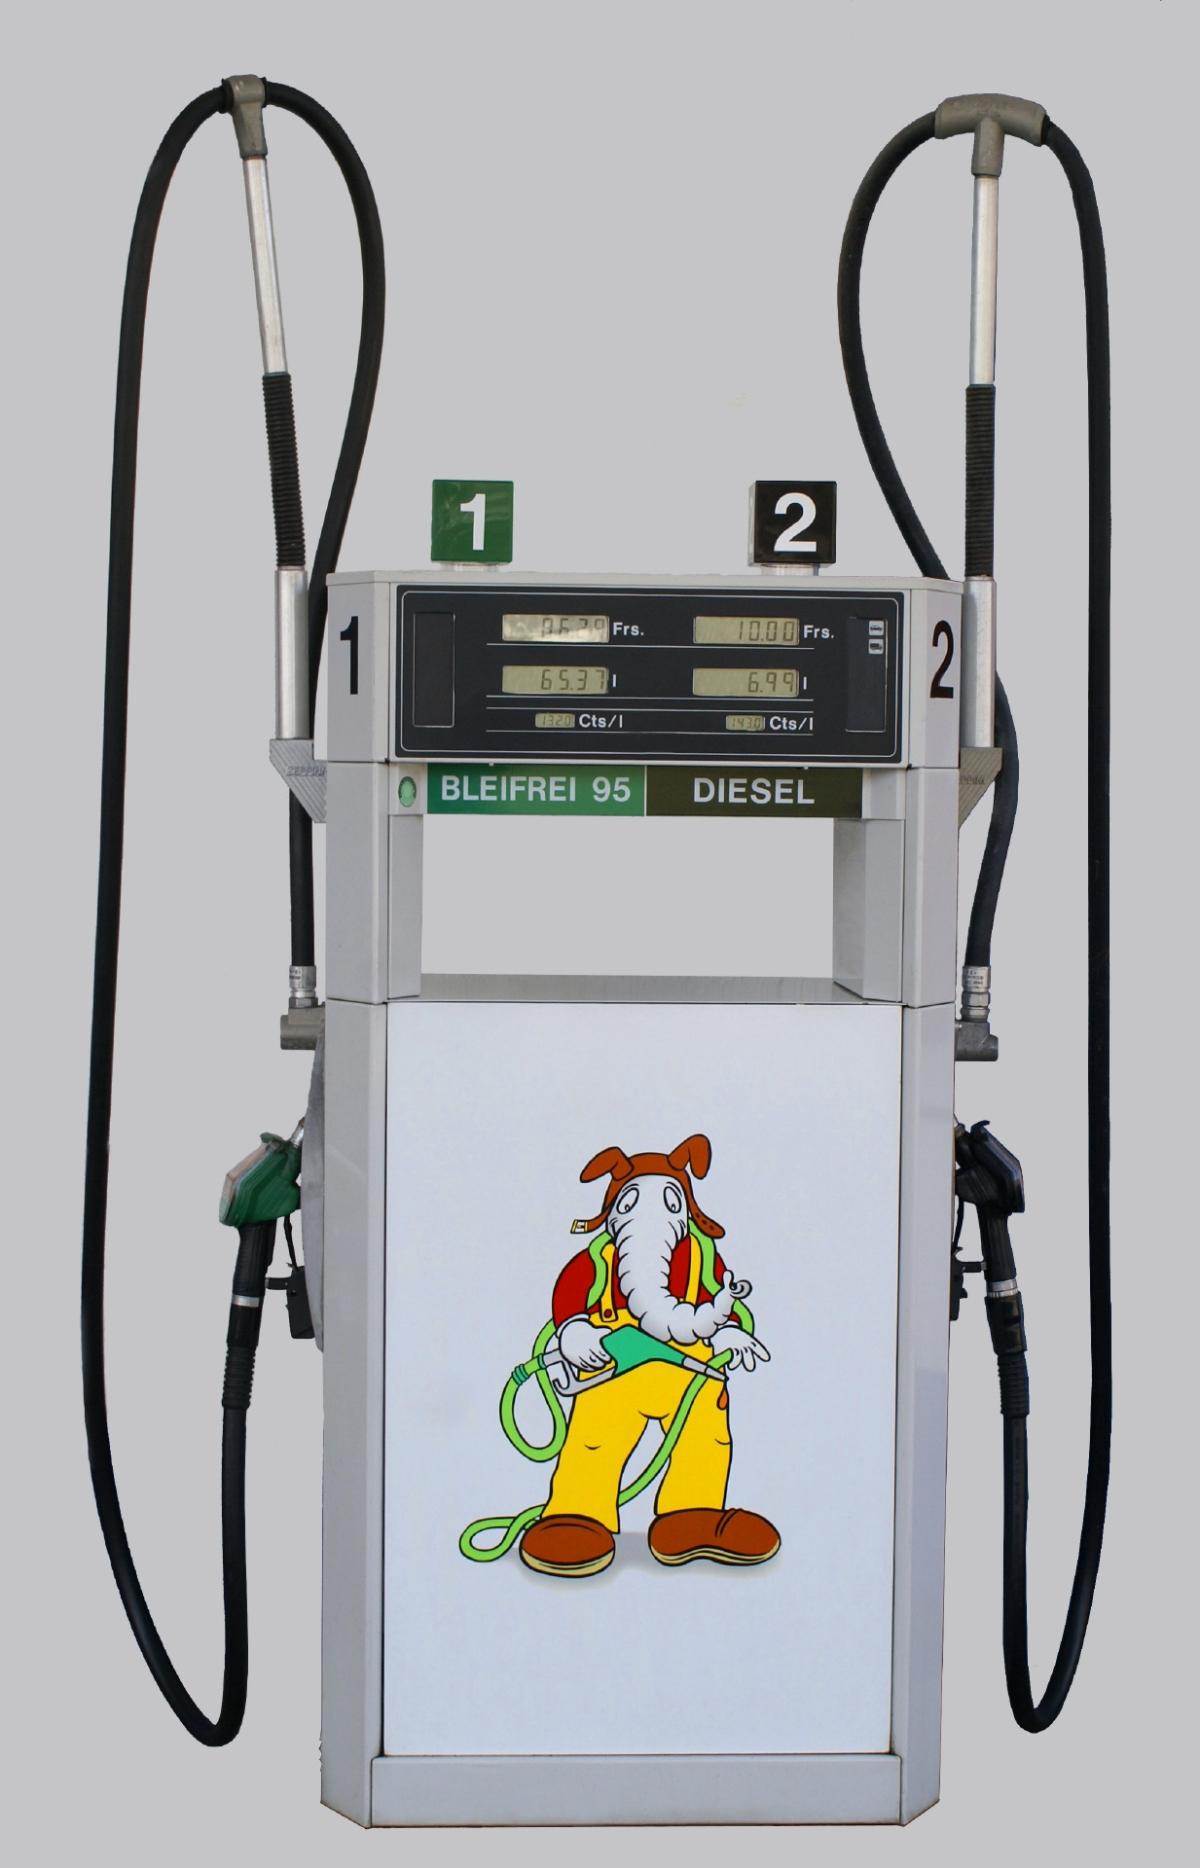 Ruedi Rüssel Tankstellenshop in Oltenüberfallen